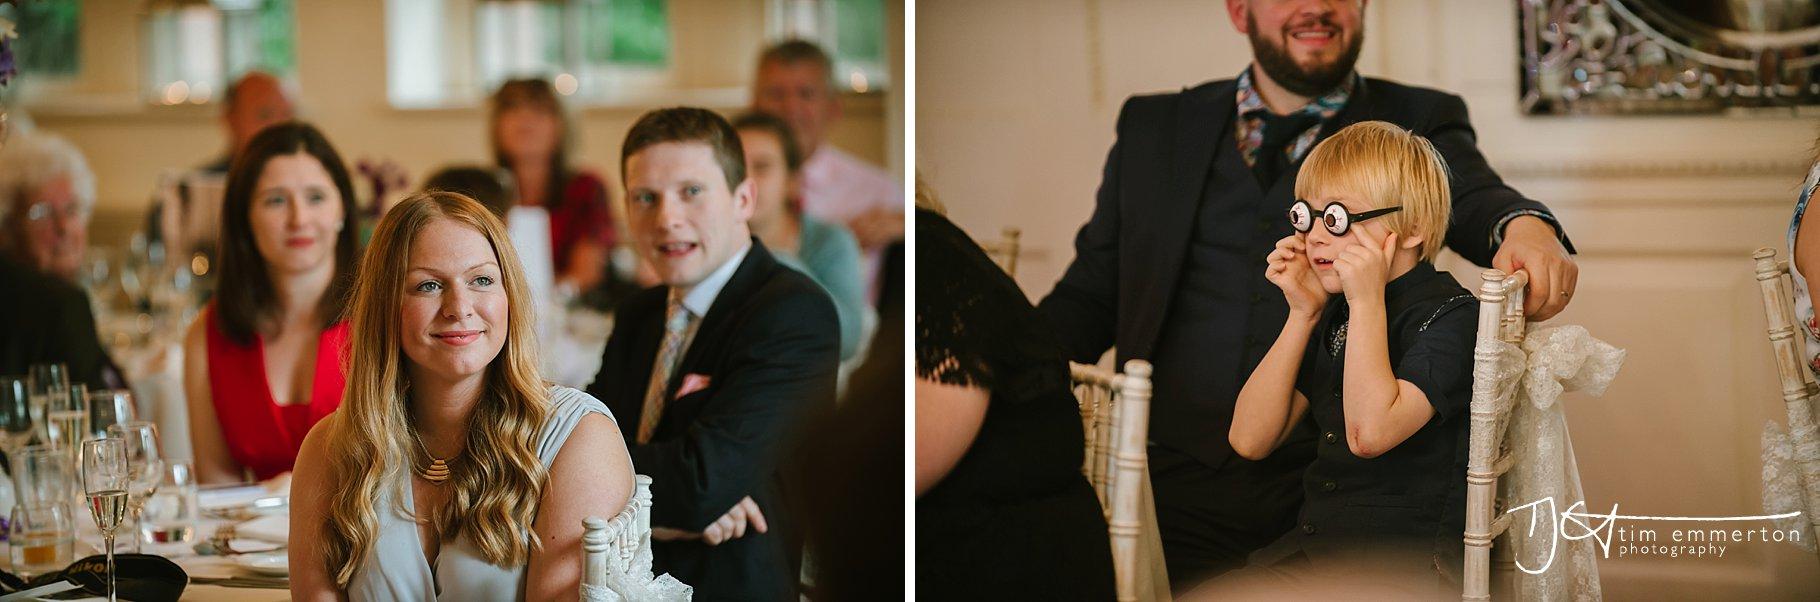 Eaves-Hall-Wedding-Photographer-116.jpg